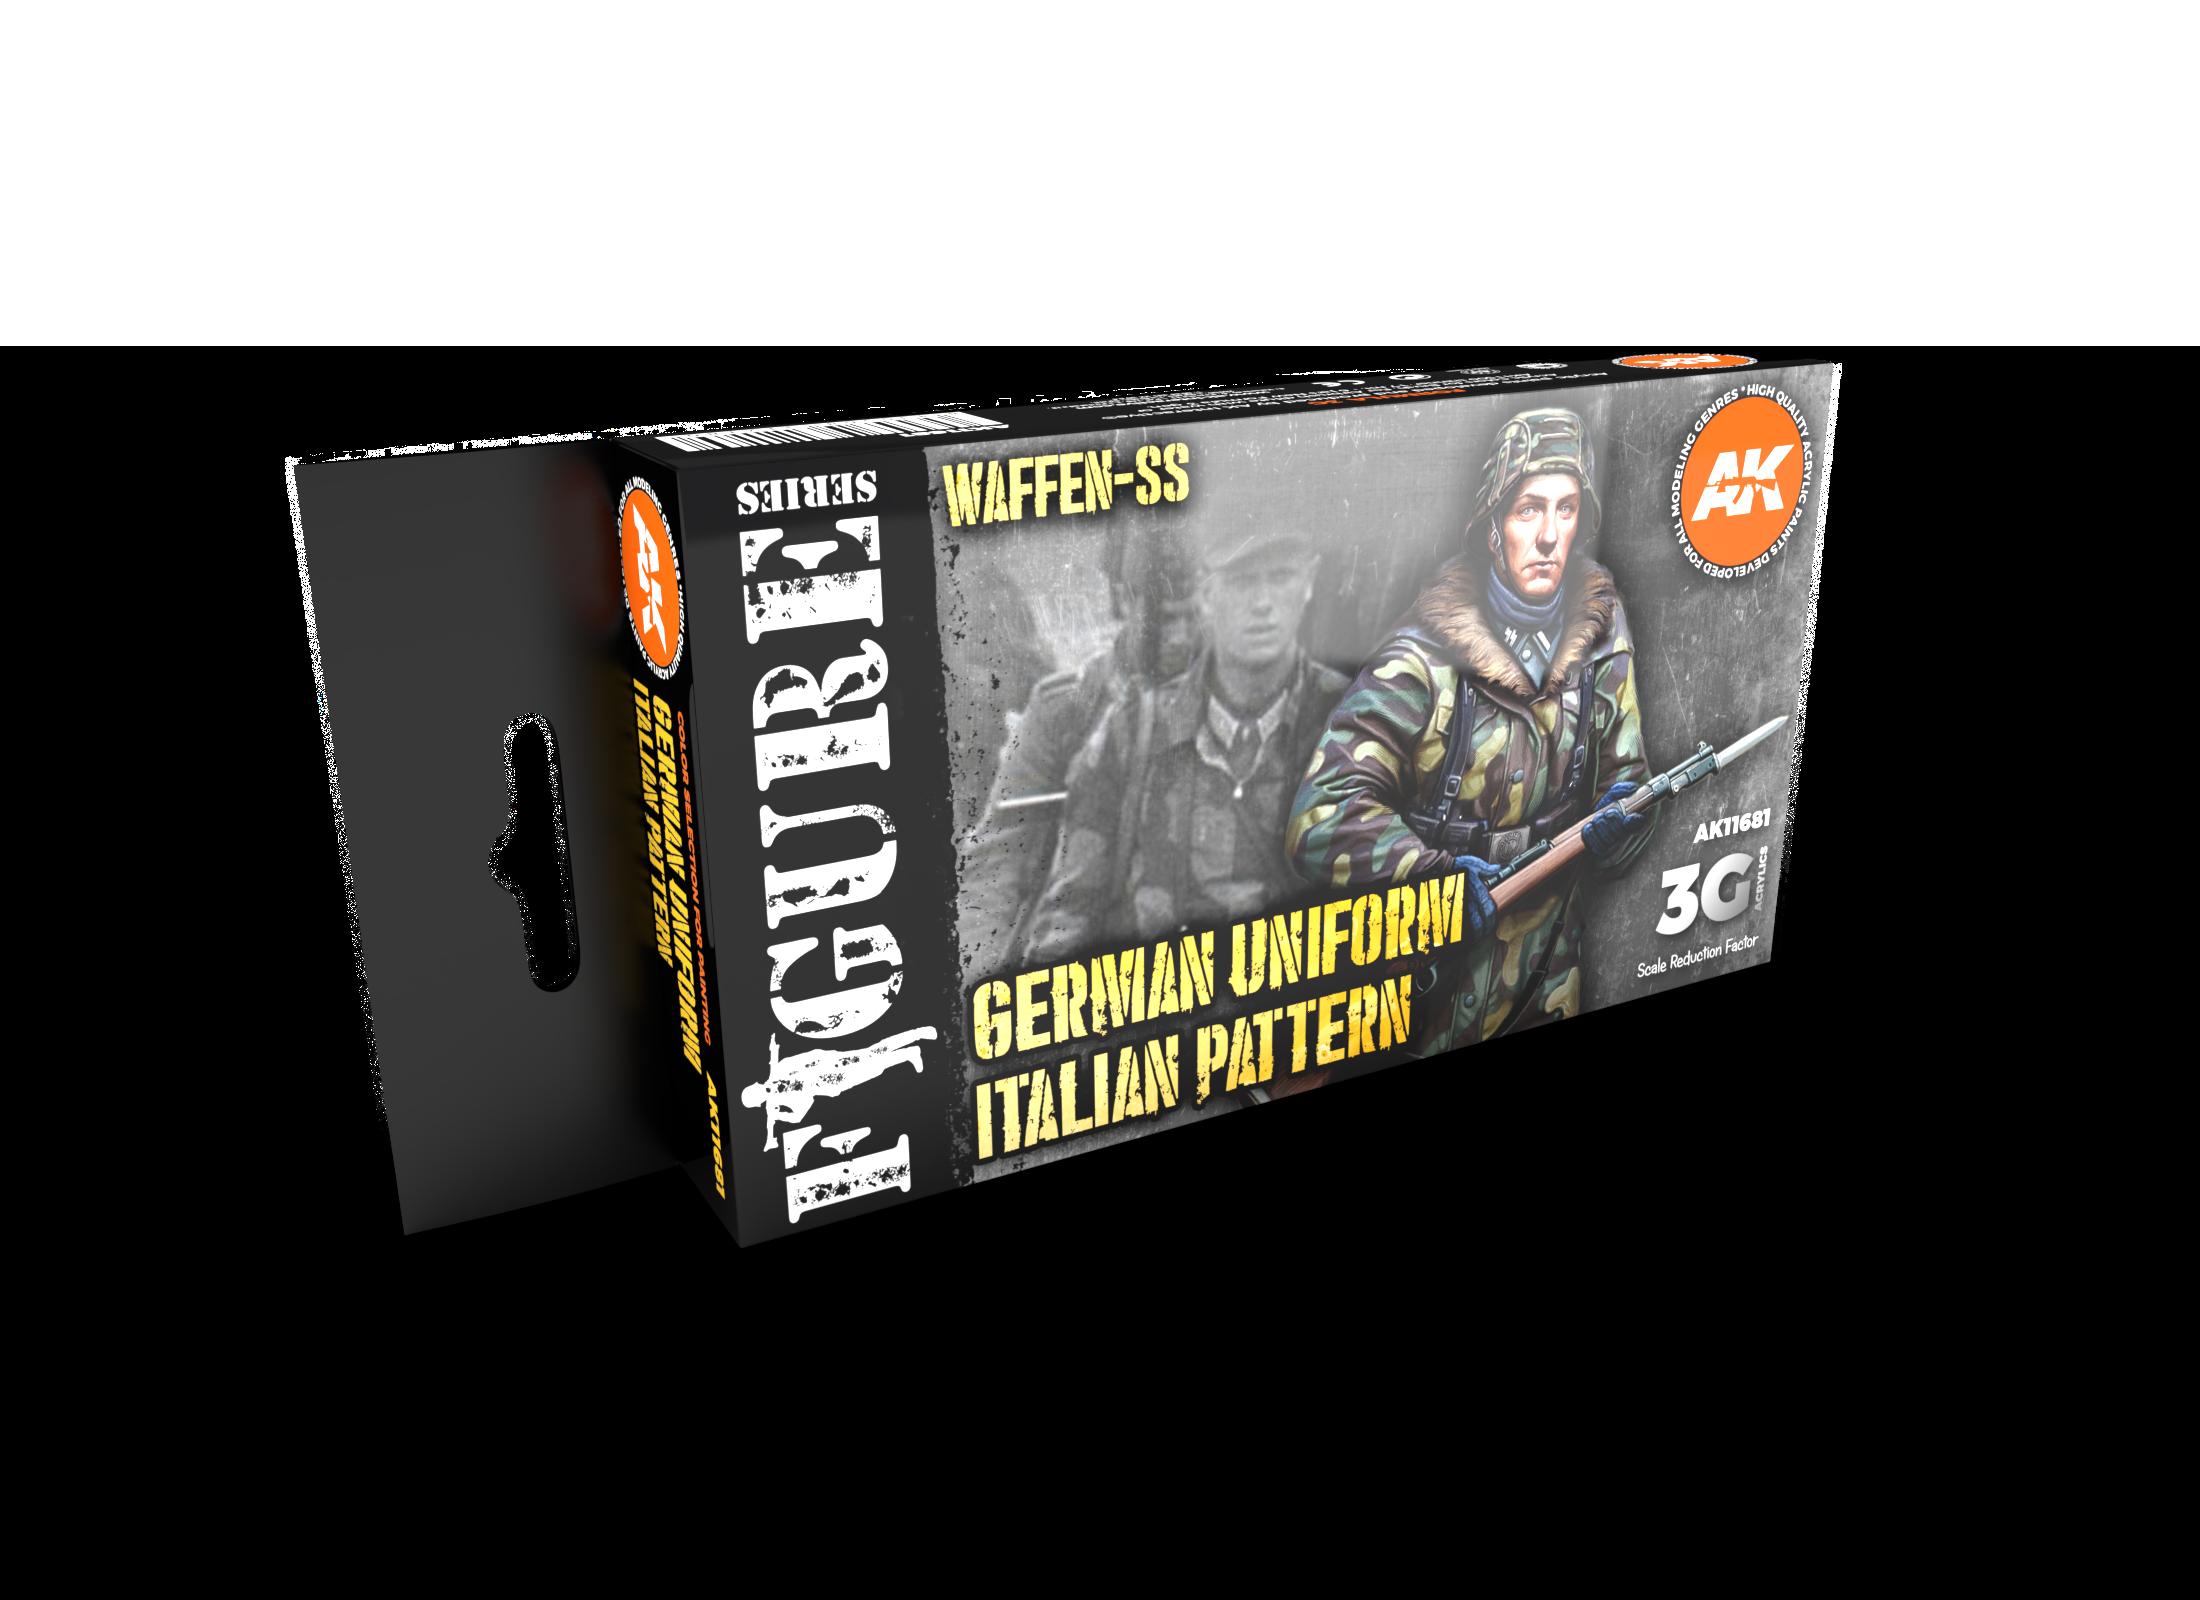 AK Interactive 3G WWII German Italian Camouflage